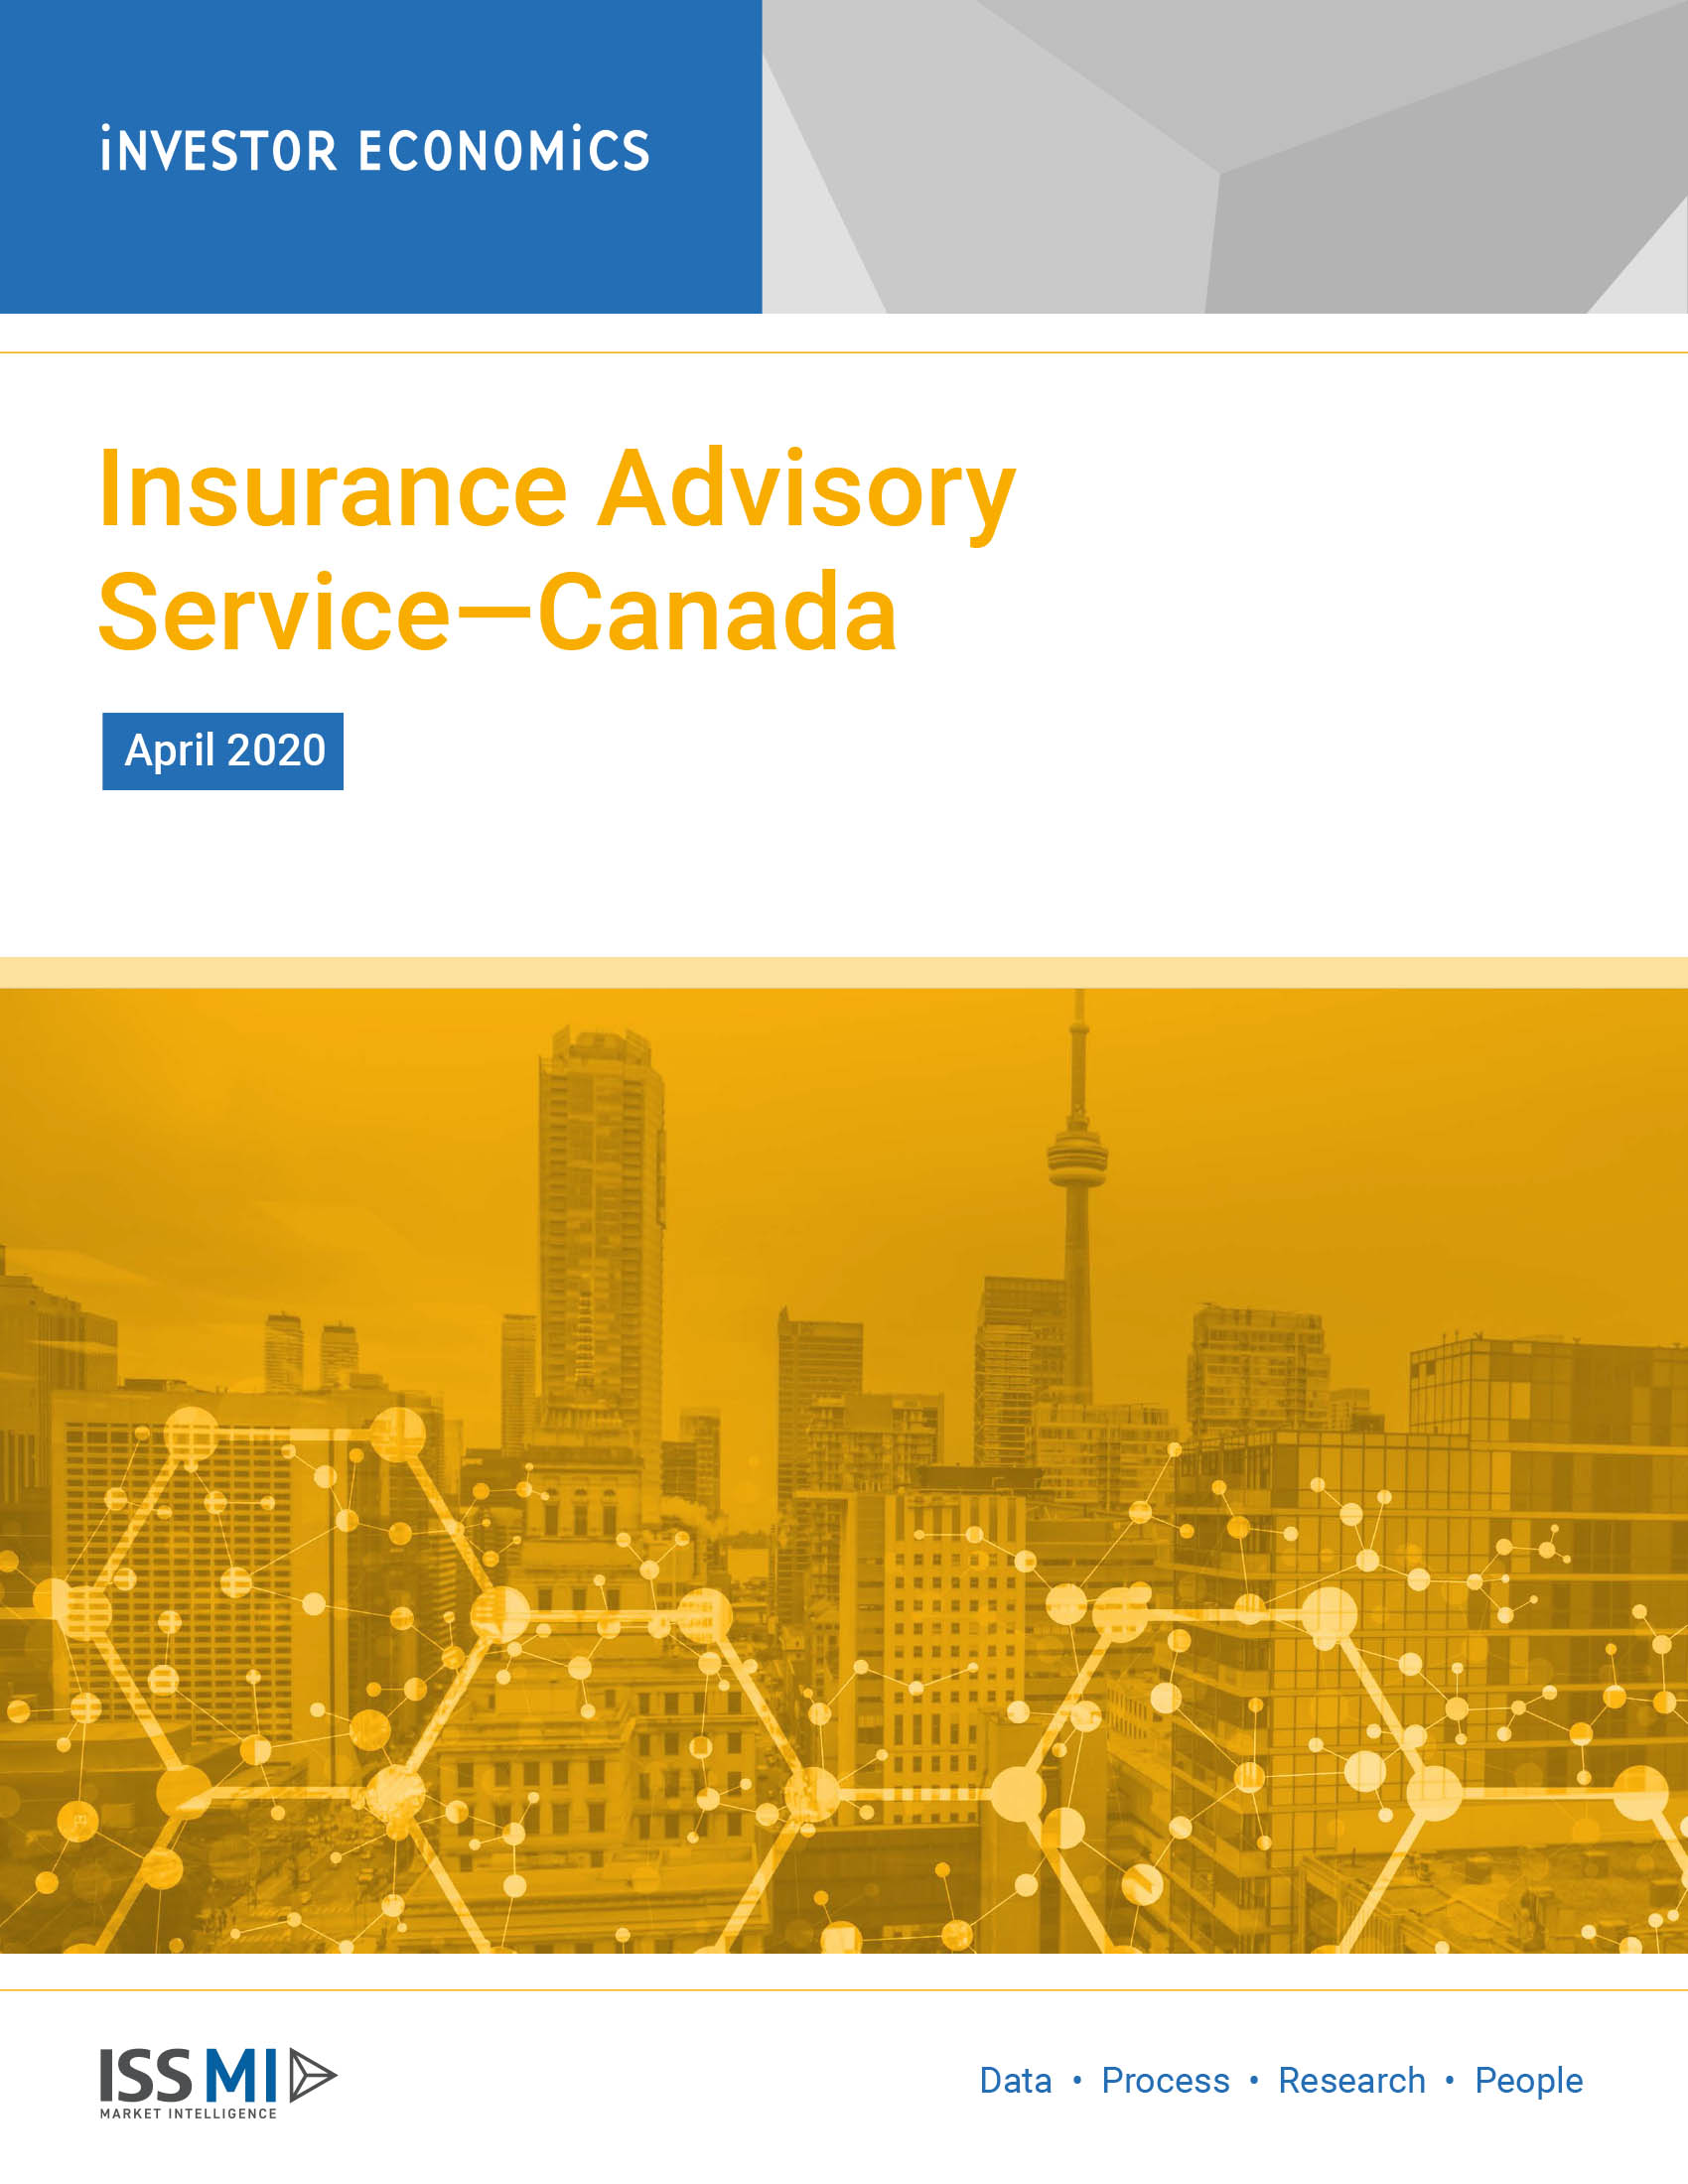 Insurance Advisory Service April 2020